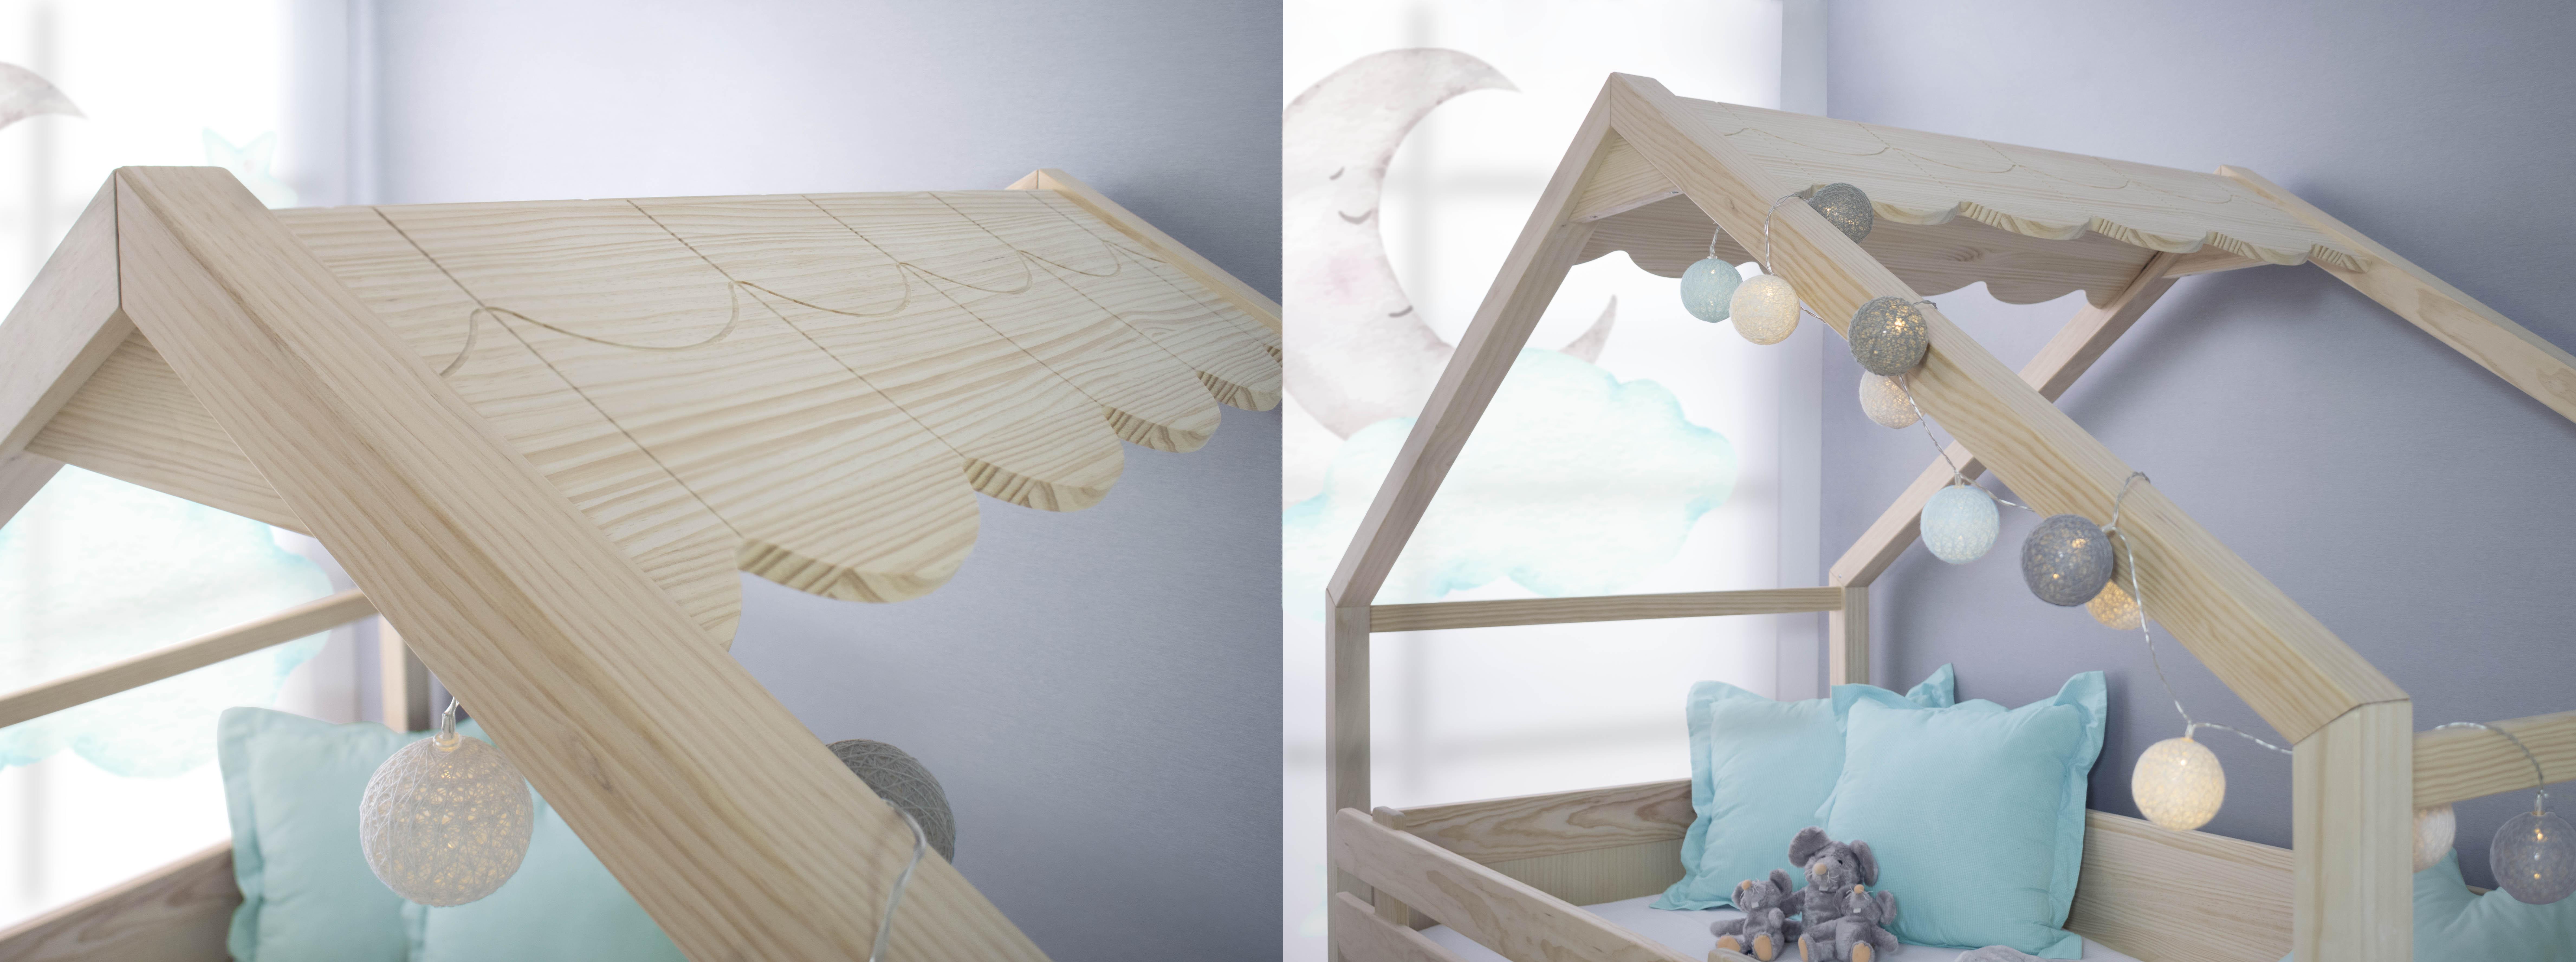 Cama casita de madera Bainba. Detalles